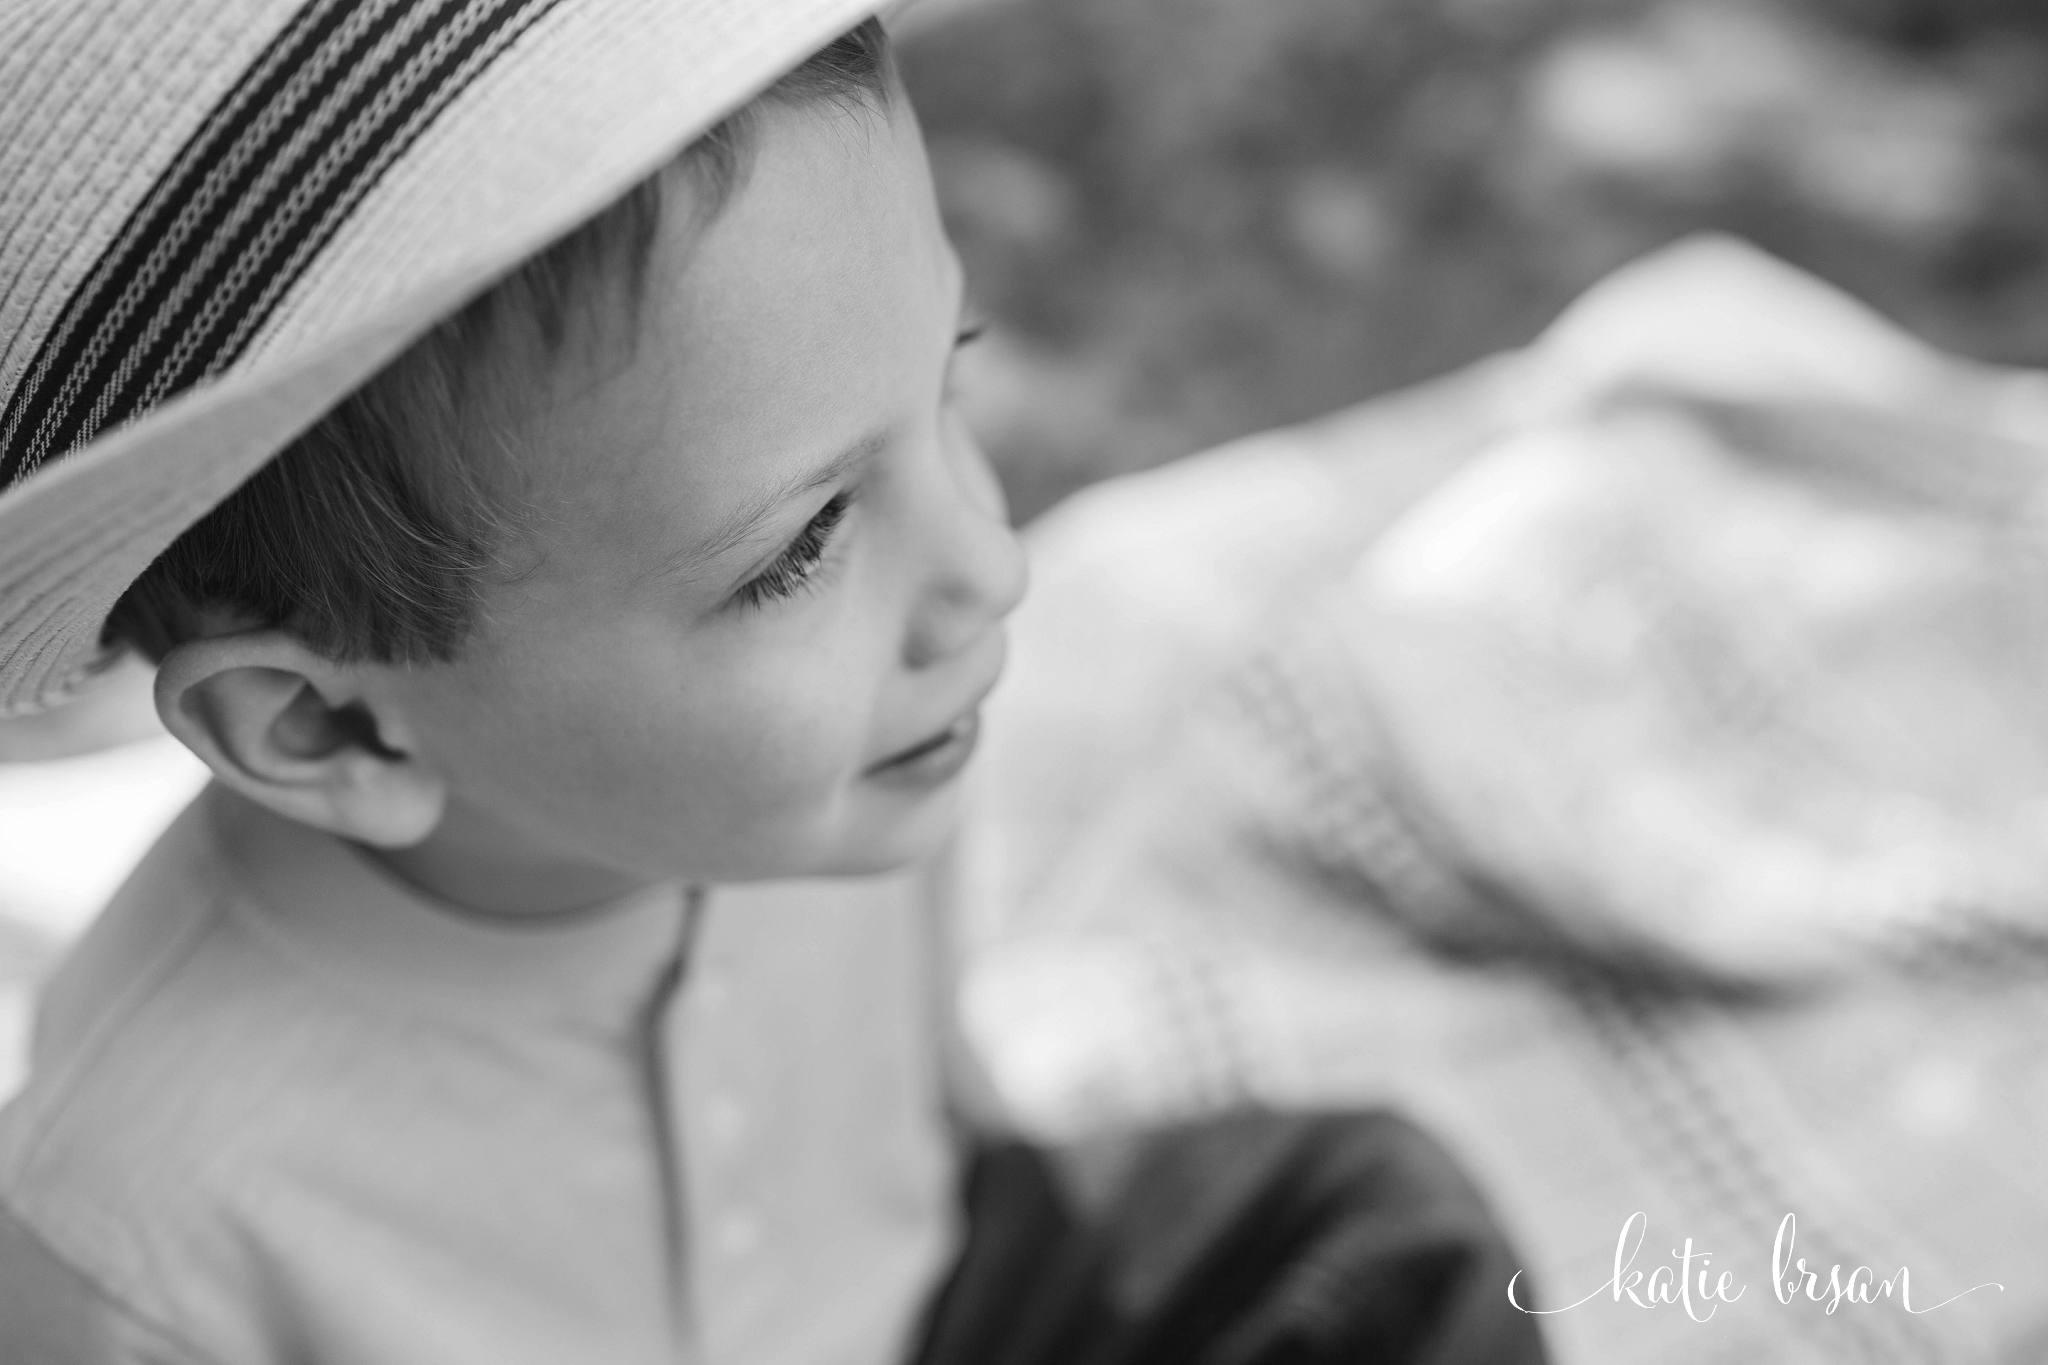 KatieBrsan-Shorewood-ChildPhotographer_0572.jpg